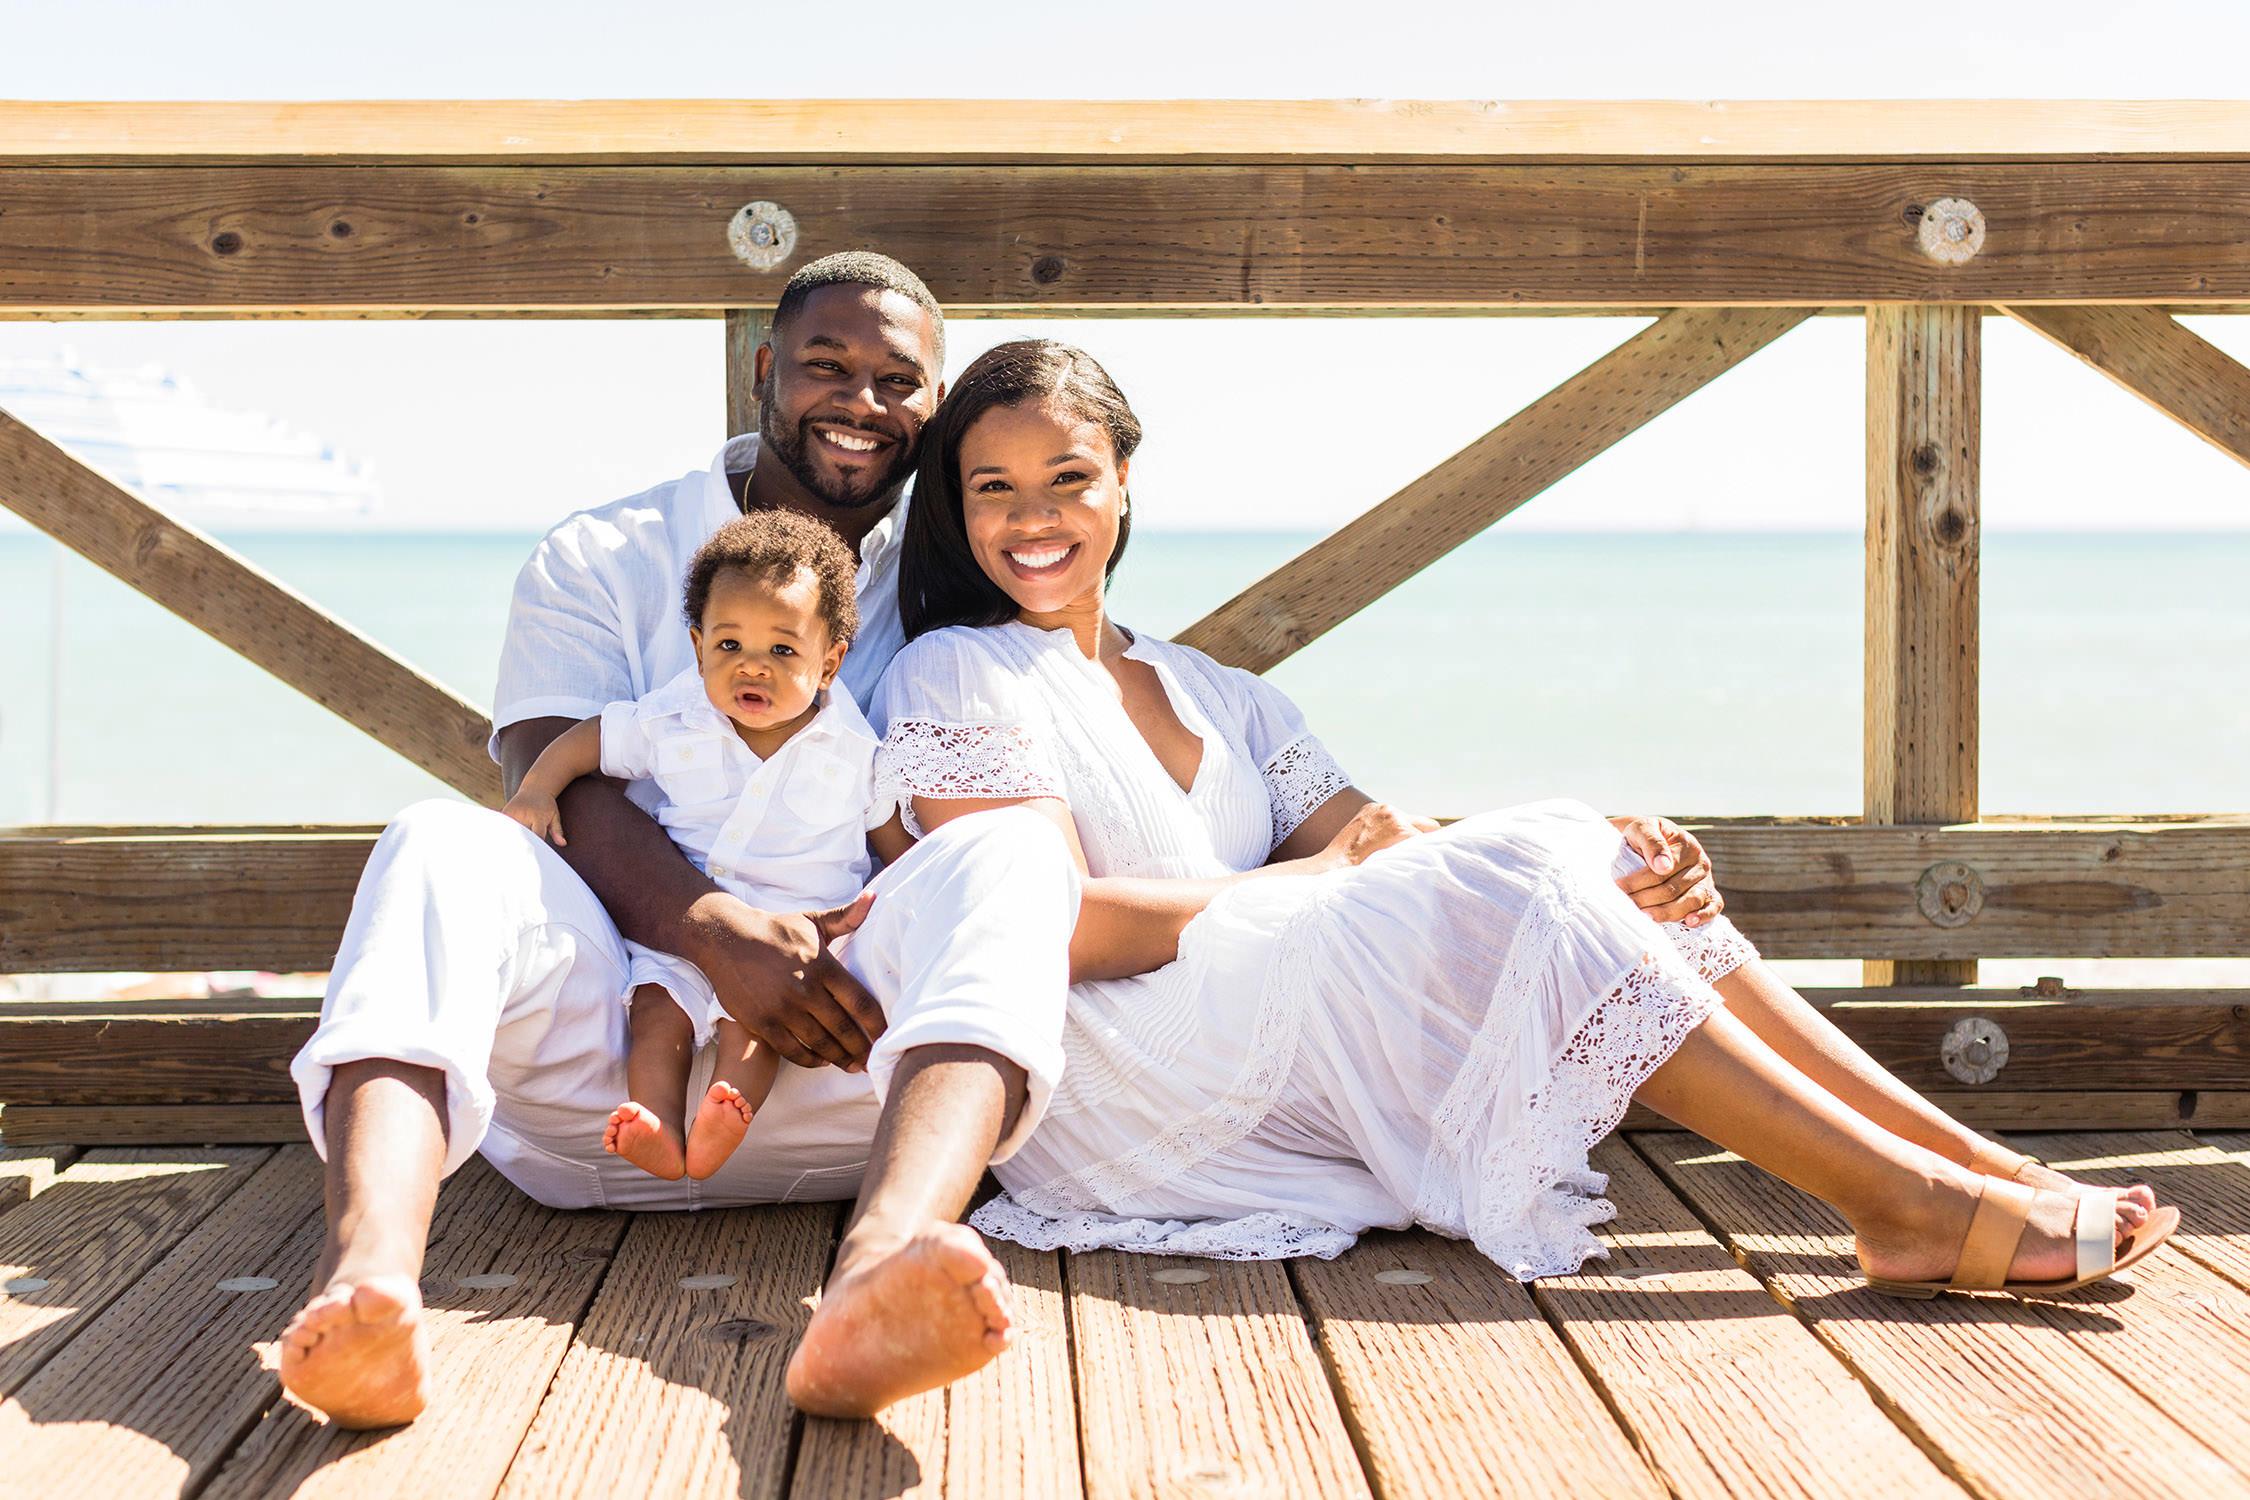 Capistrano beach park san juan capistrano family portraits